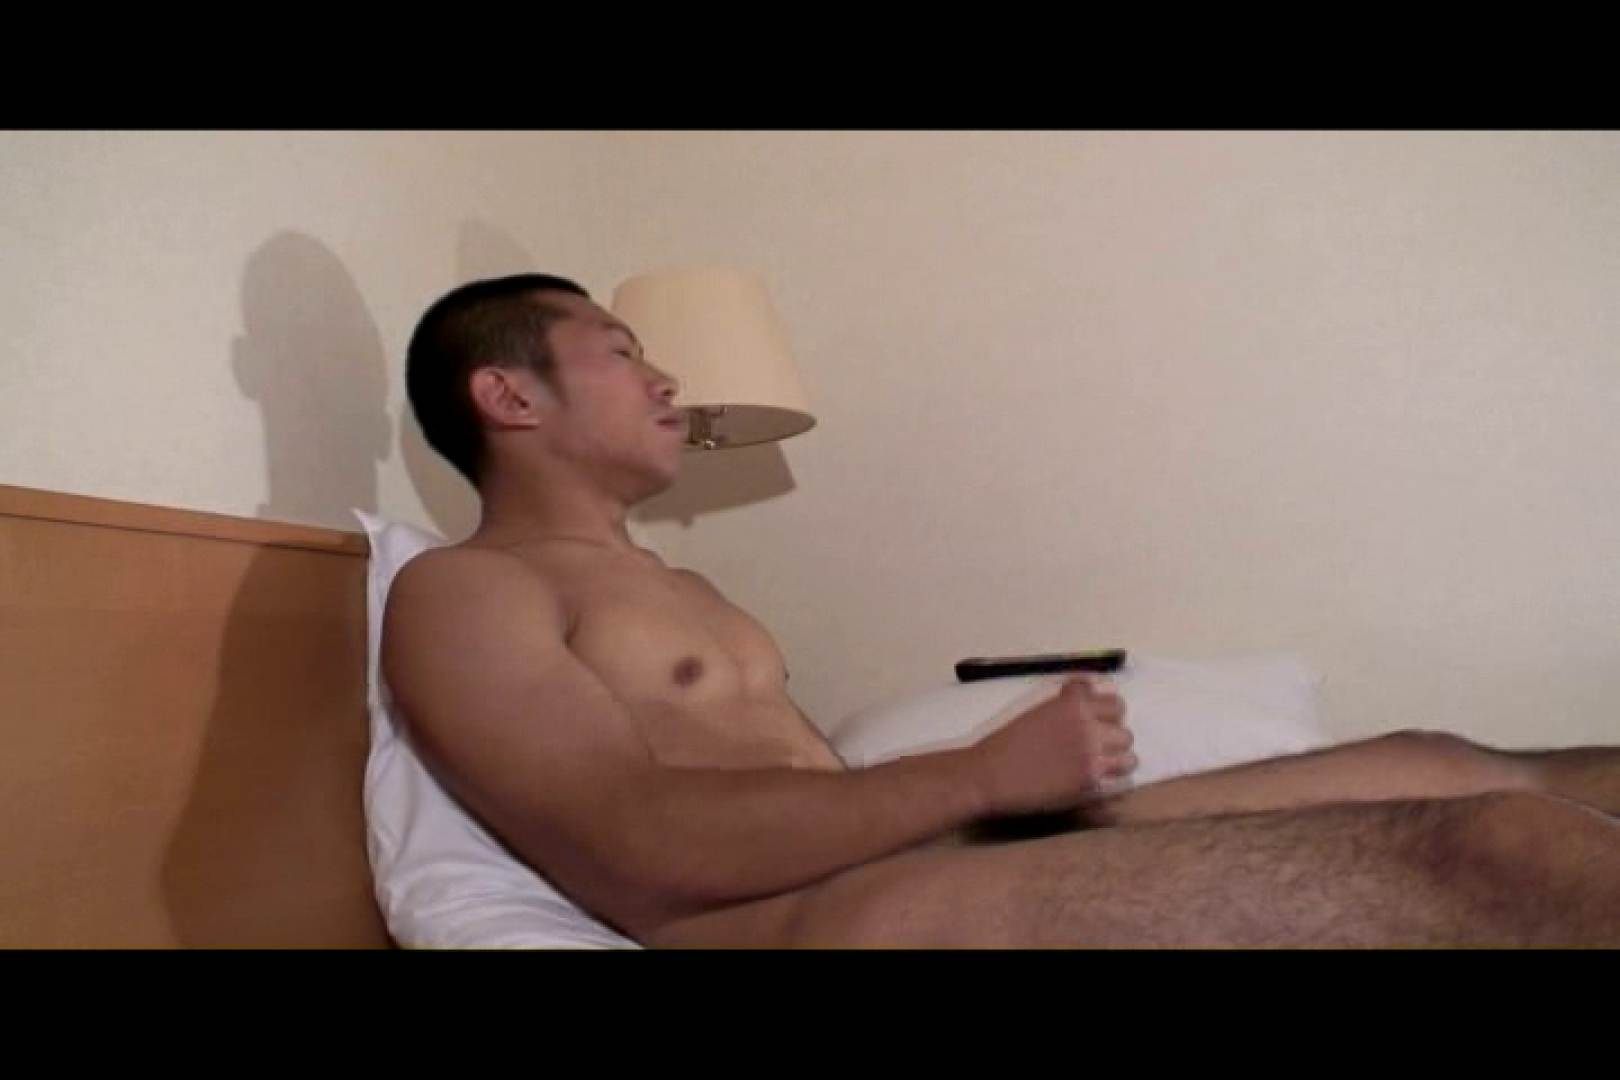 Bistro「イケメン」~Mokkori和風仕立て~vol.04 マッチョ特集 男同士動画 91枚 59